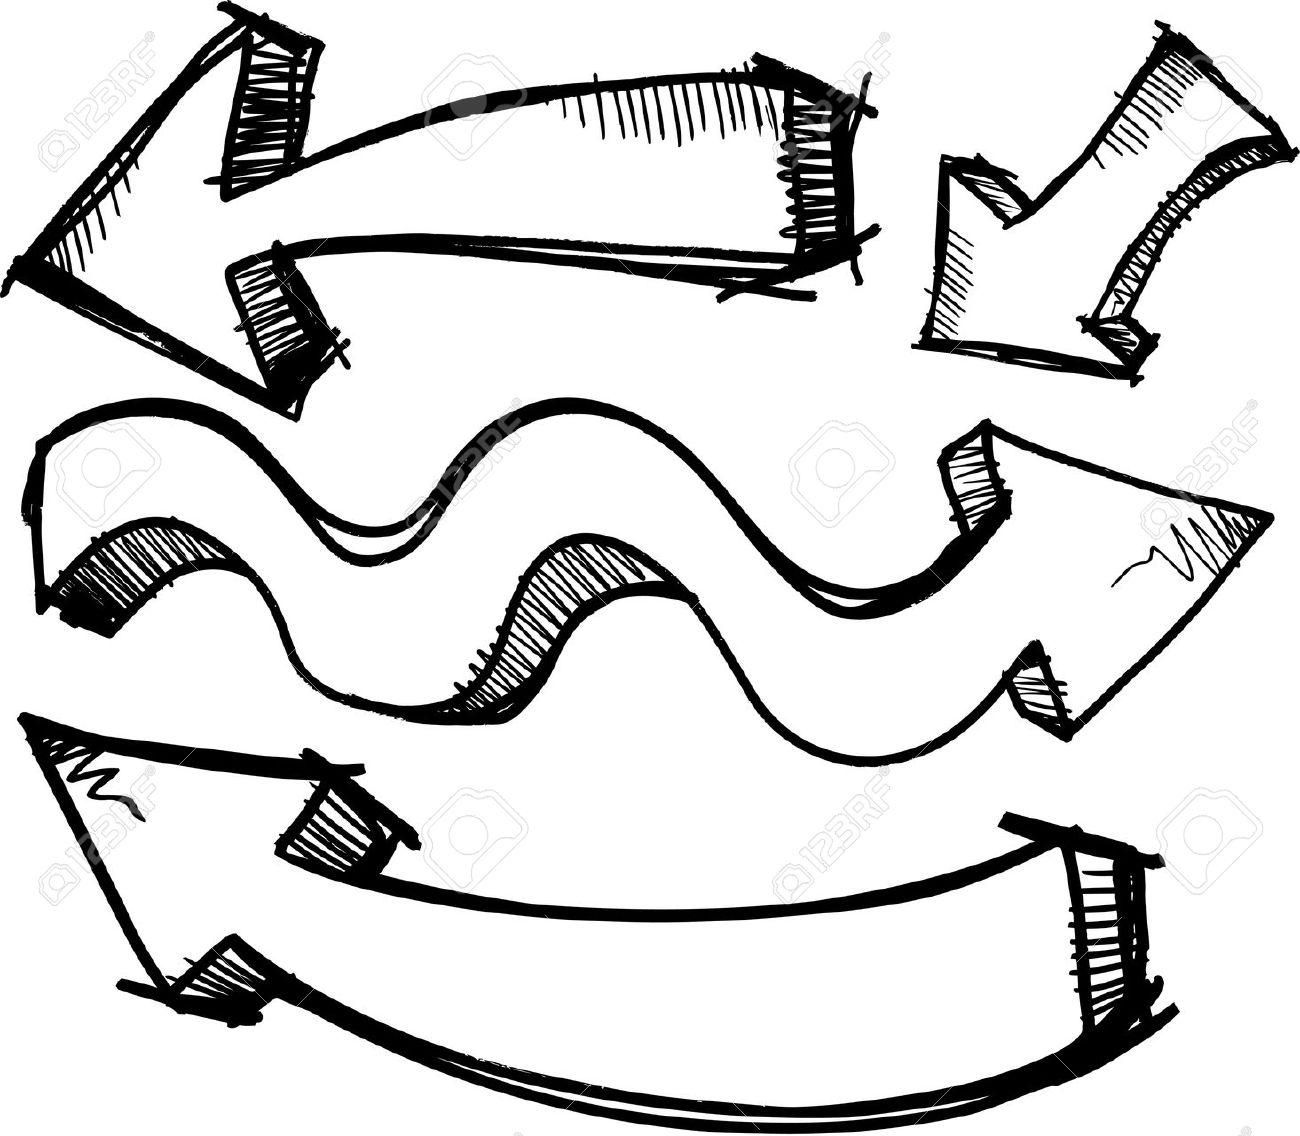 1300x1136 Arrow Clipart Doodle